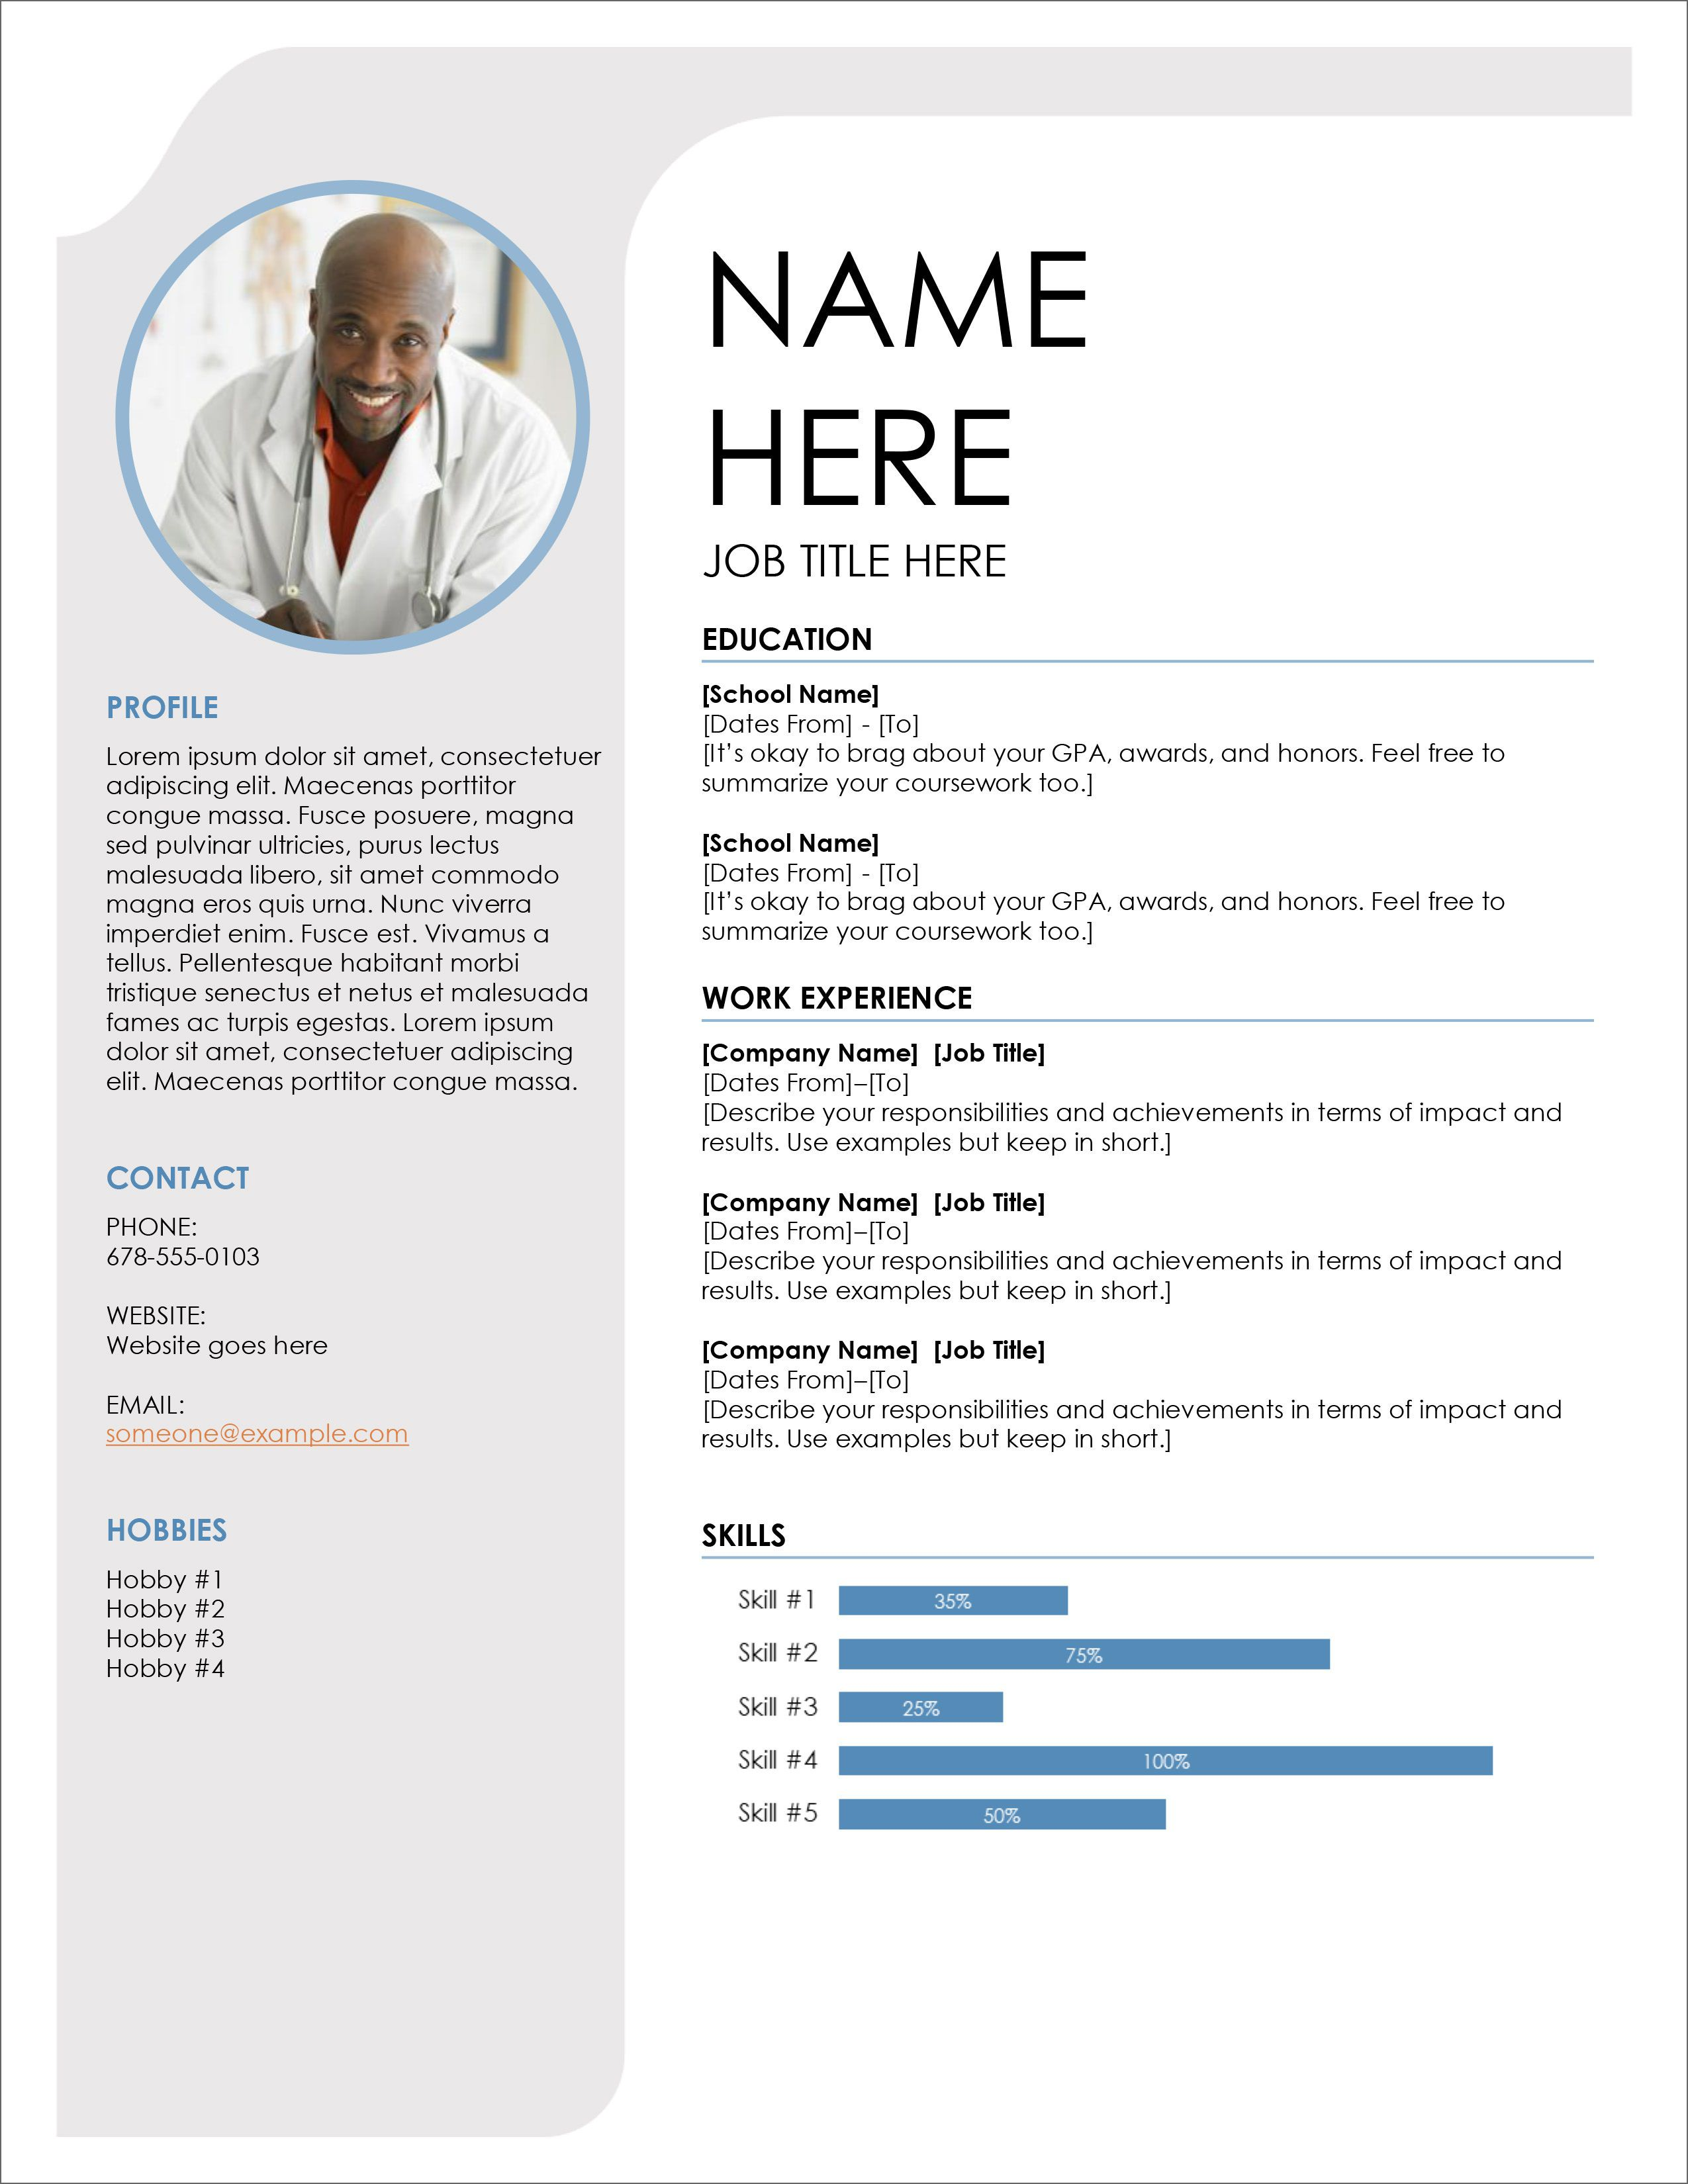 005 Wonderful Download Resume Template Microsoft Word Photo  Creative Free For Fresher FunctionalFull